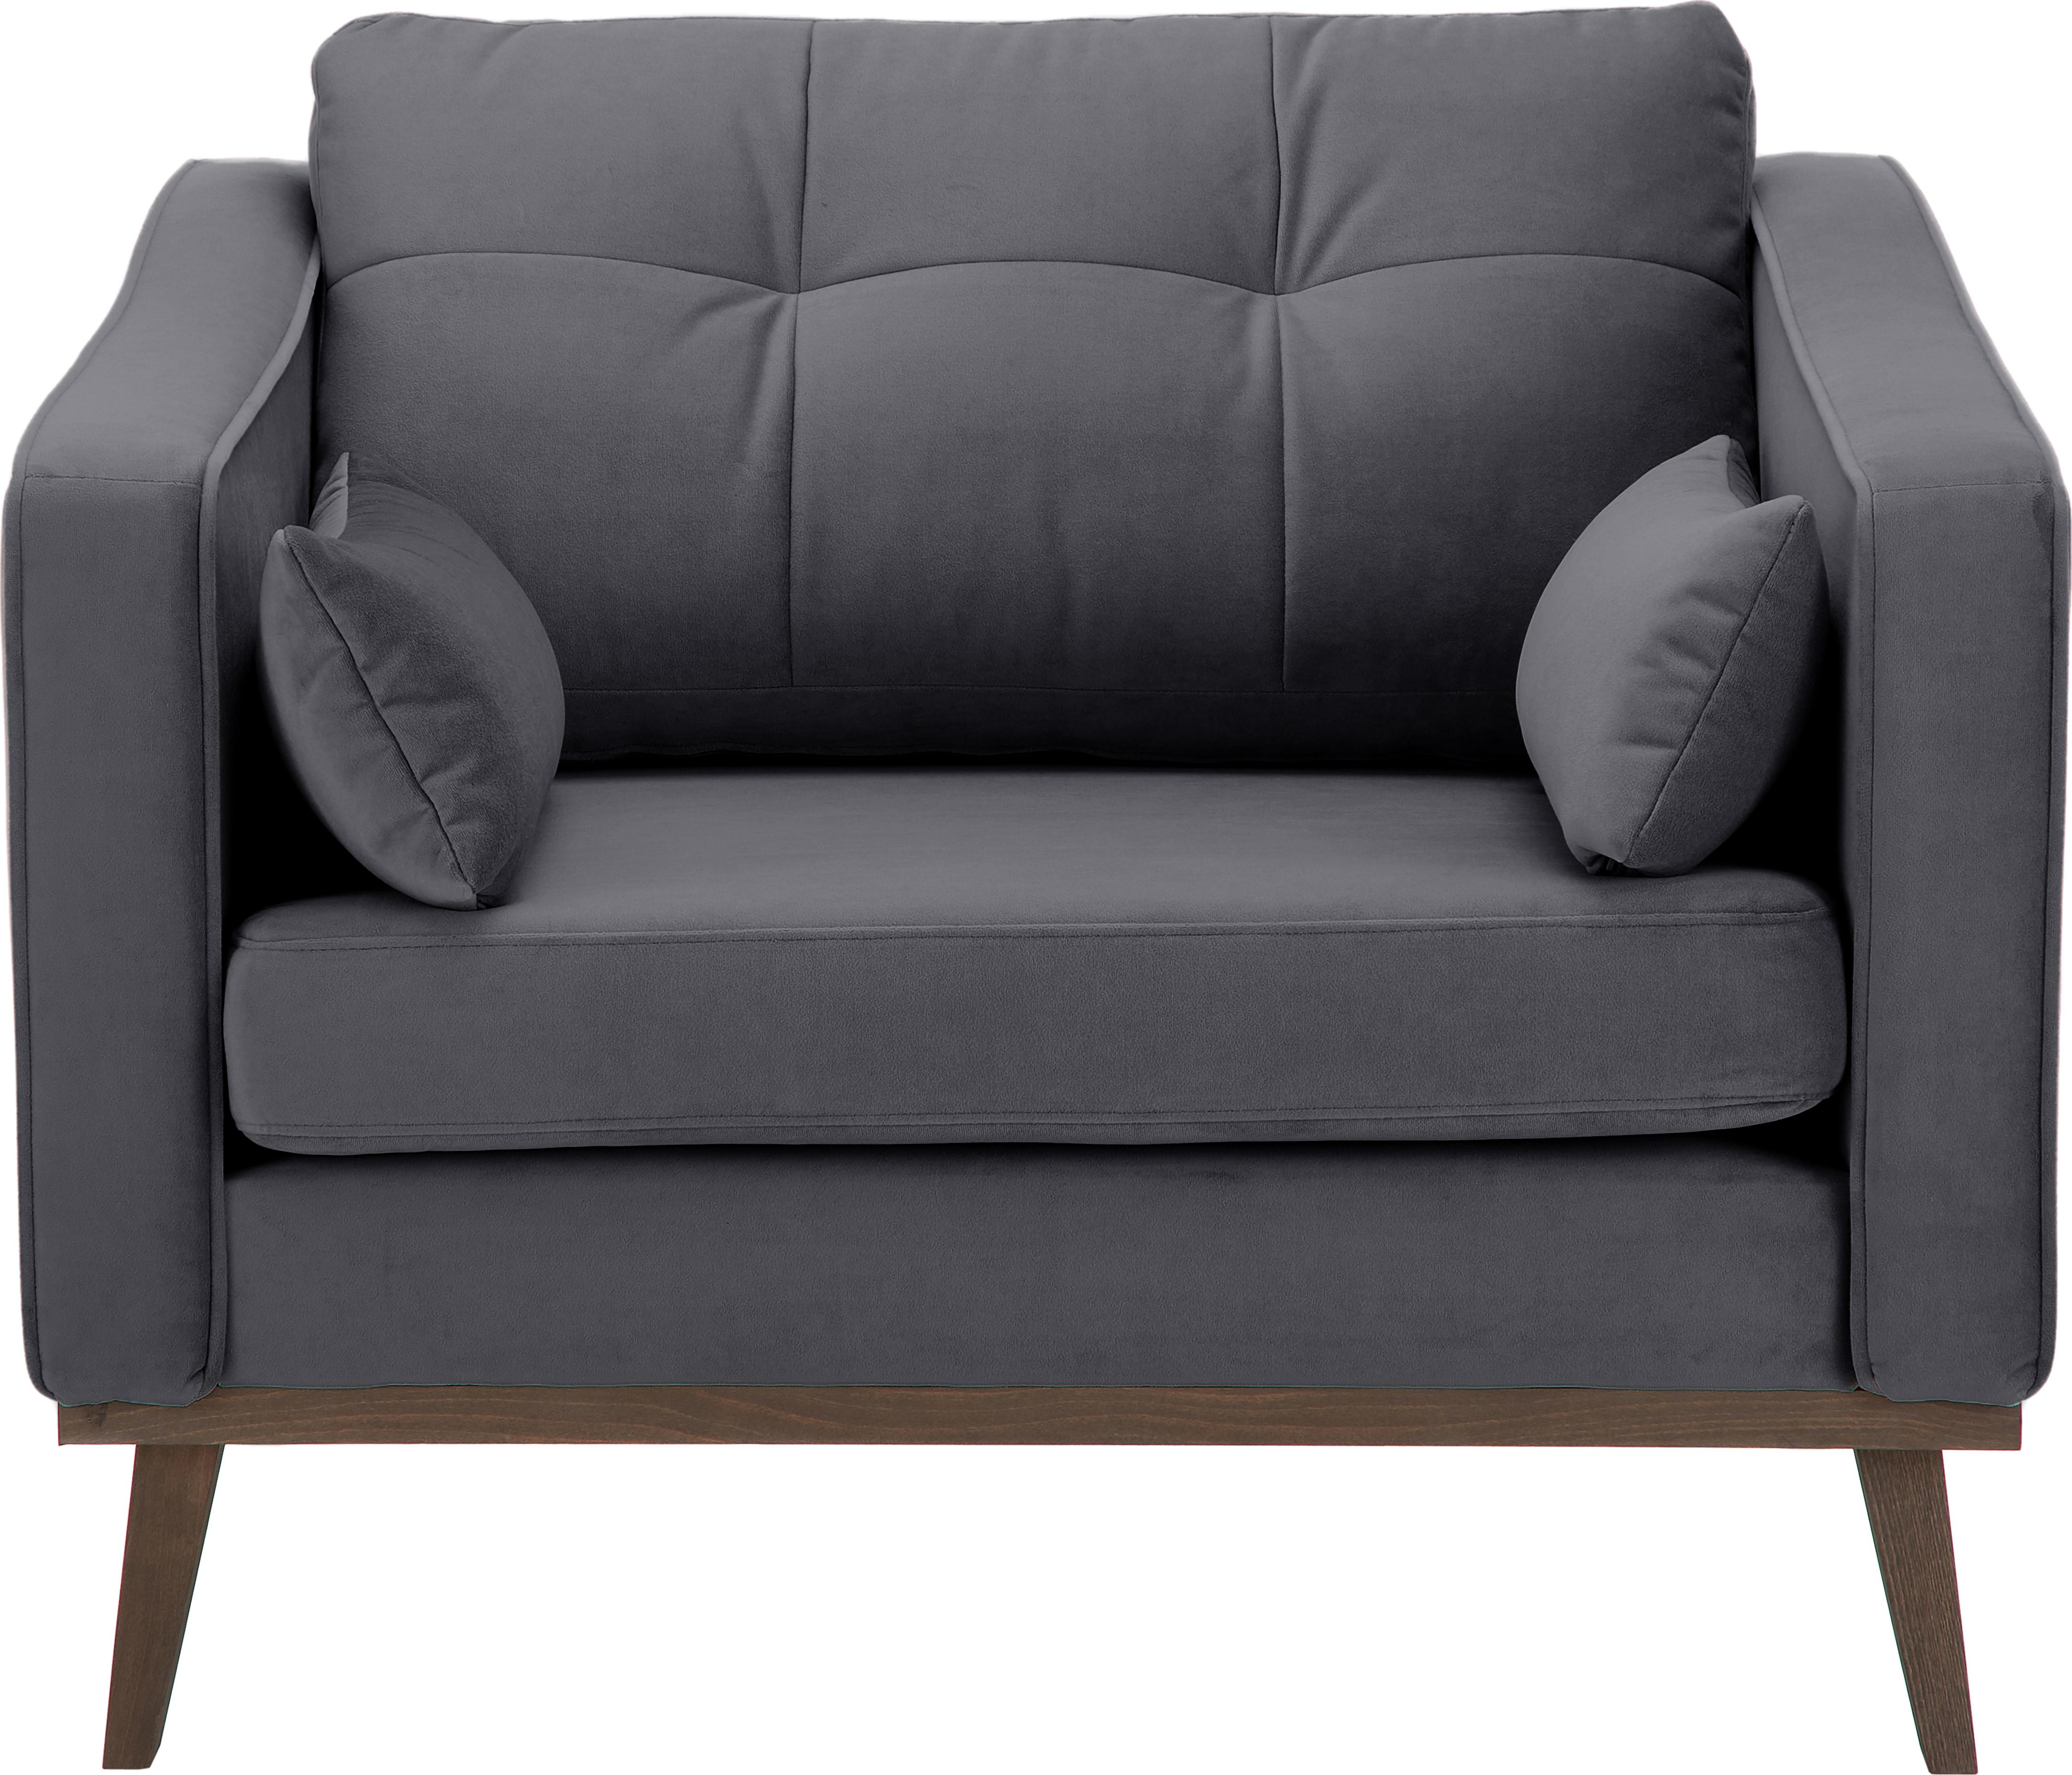 Klassischer Samt-Sessel Alva in Grau, Bezug: Samt (Hochwertiger Polyes, Gestell: Massives Kiefernholz, Füße: Massives Buchenholz, gebe, Samt Dunkelgrau, B 102 x T 92 cm